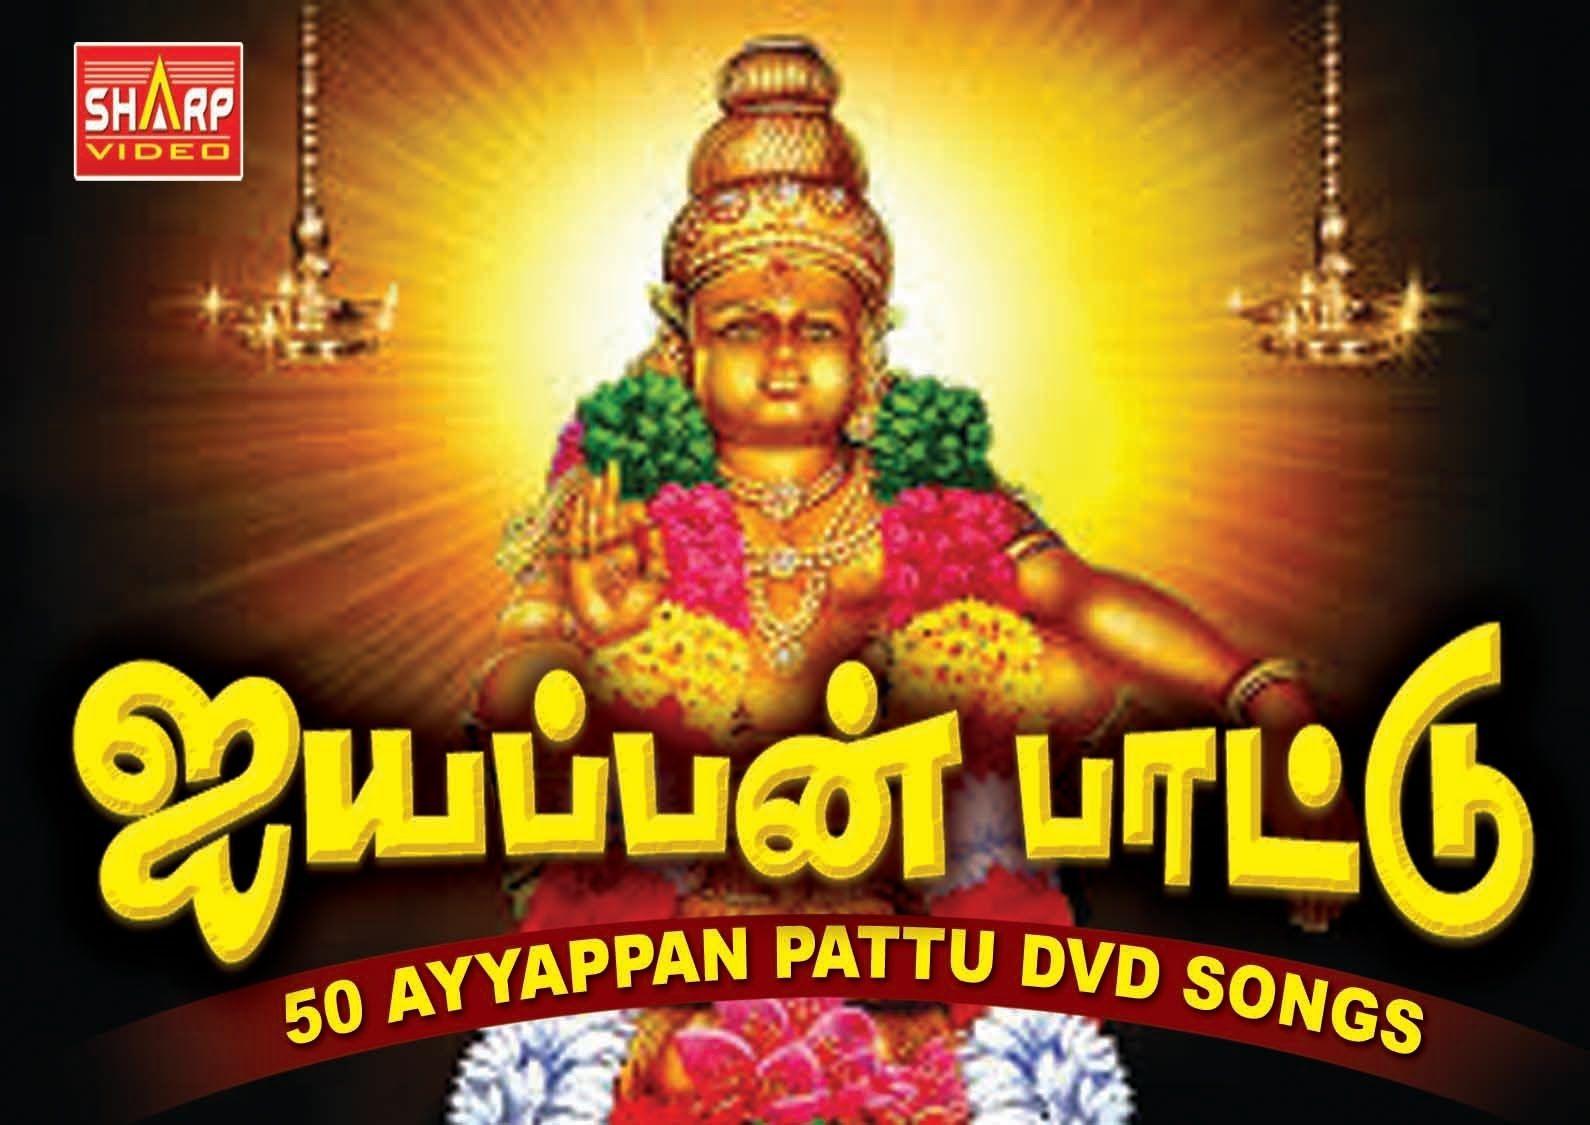 SaranamIyyappaSwami_Ayyappan Pattu | Songs, Broadway shows